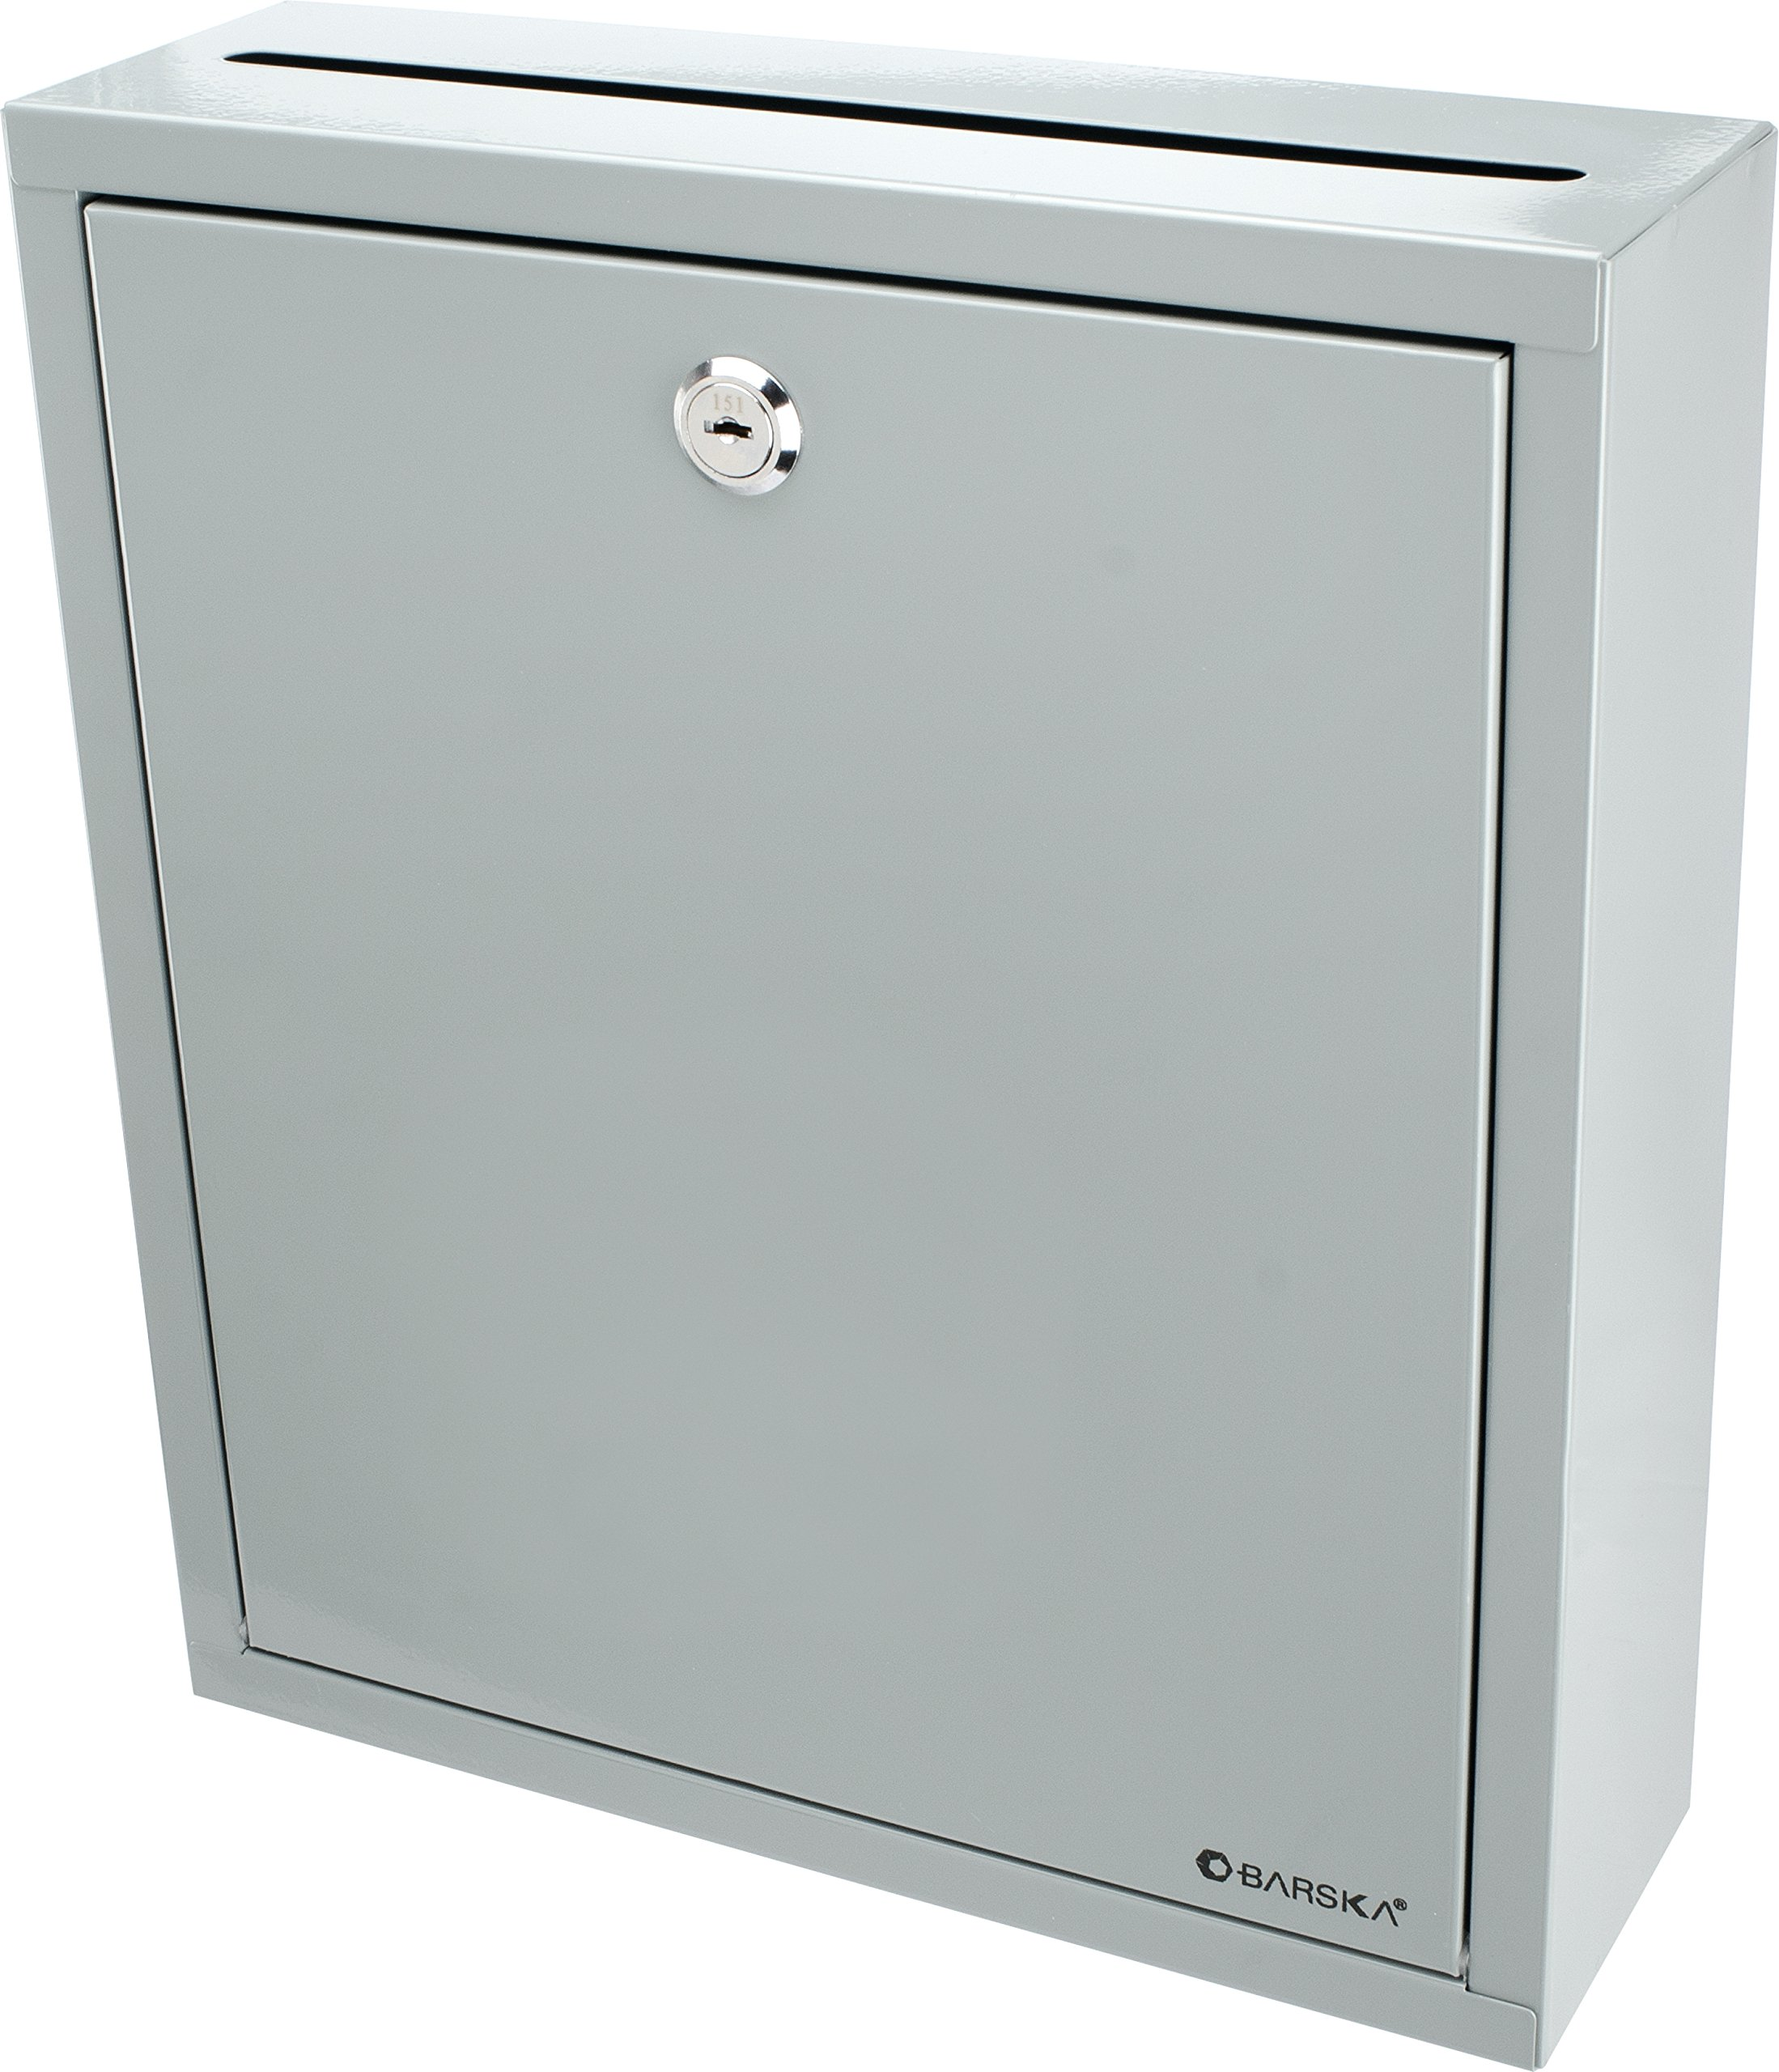 Barska Multi-Purpose Drop Box, Grey, Large